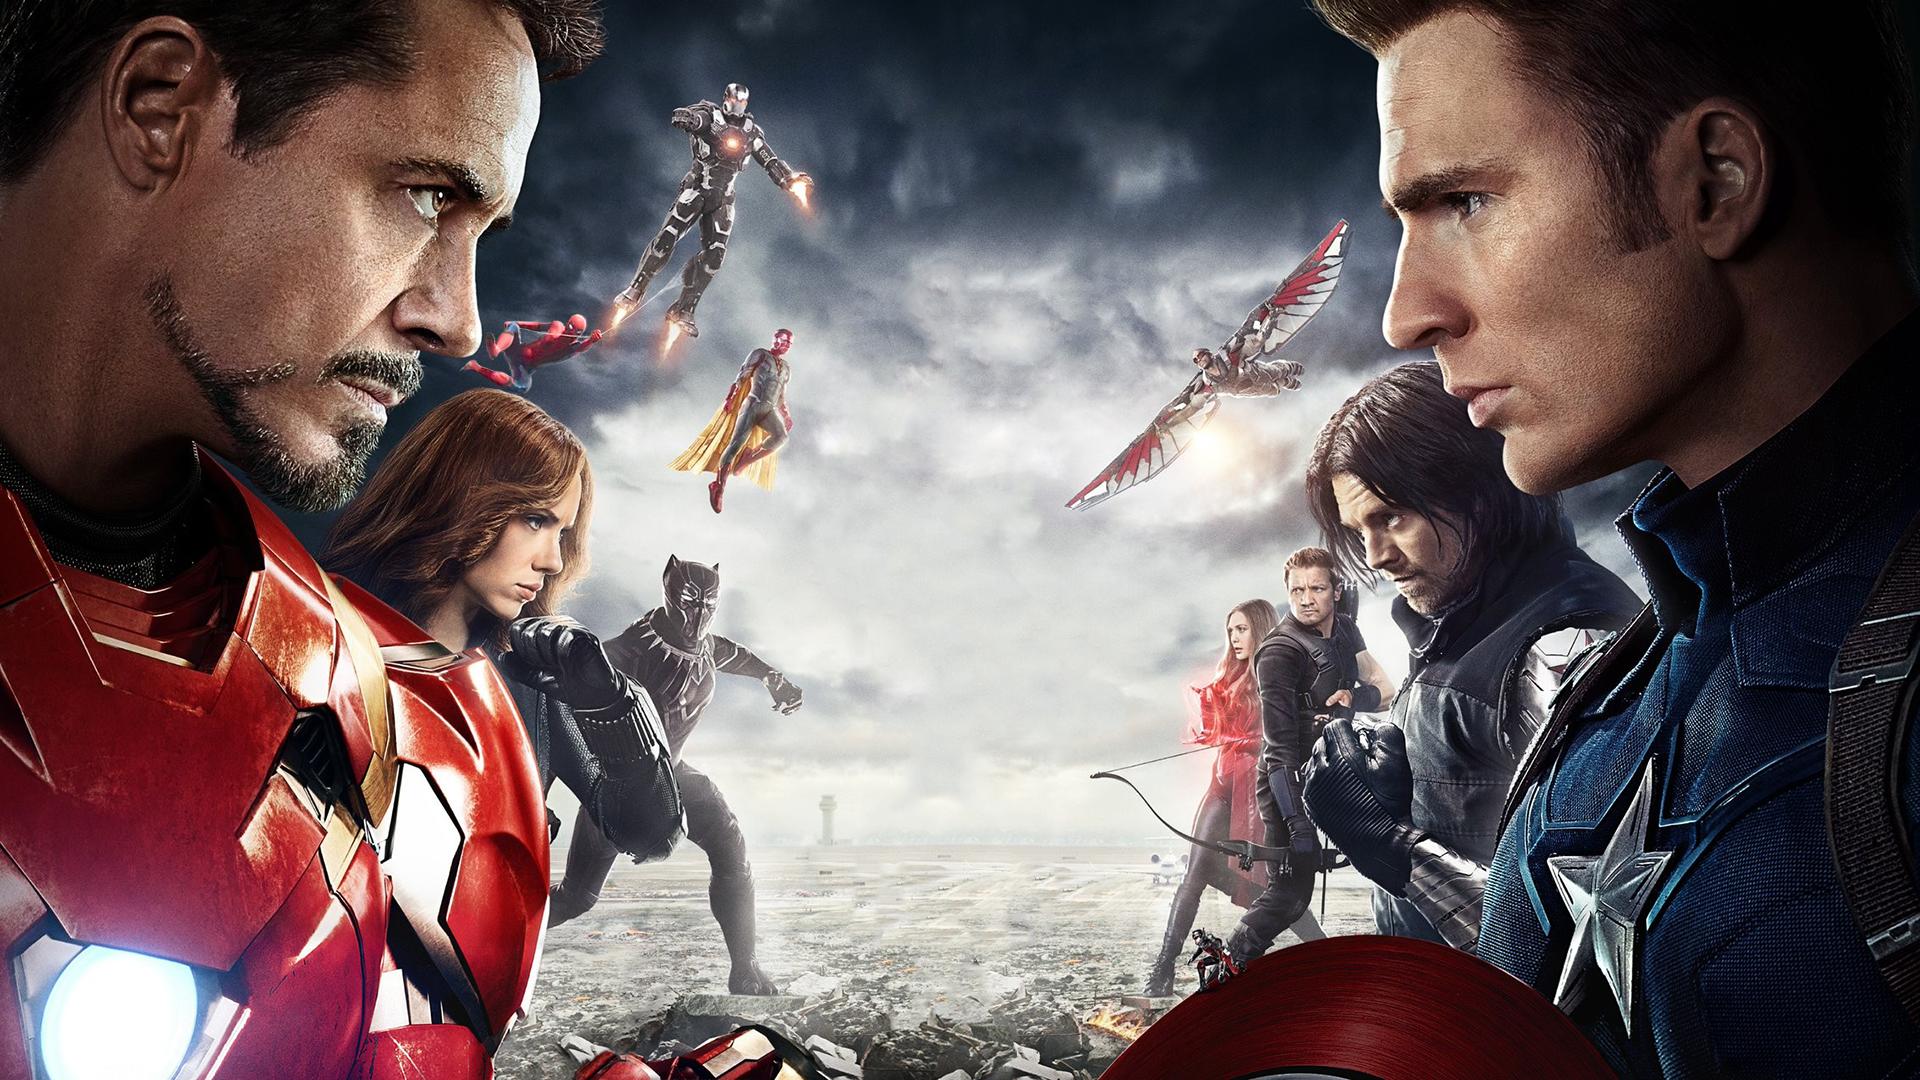 Simple Wallpaper Movie Captain America Civil War - textless_captain_america__civil_war_wp_w__spidey_by_davehz-da1ccu5  Photograph_798663.png